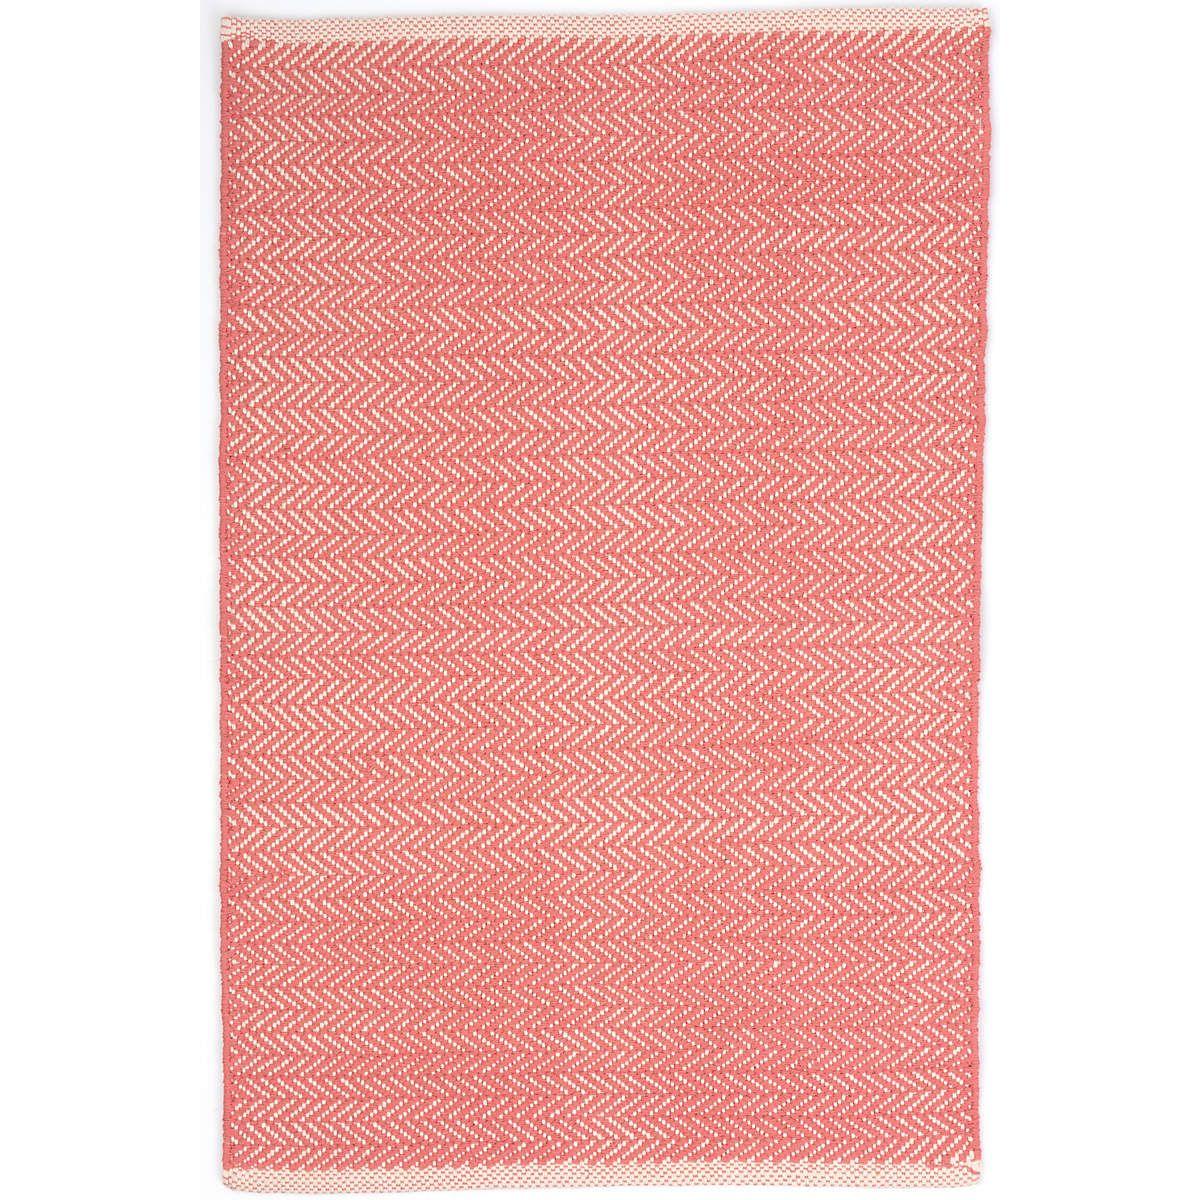 Herringbone C Woven Cotton Rug